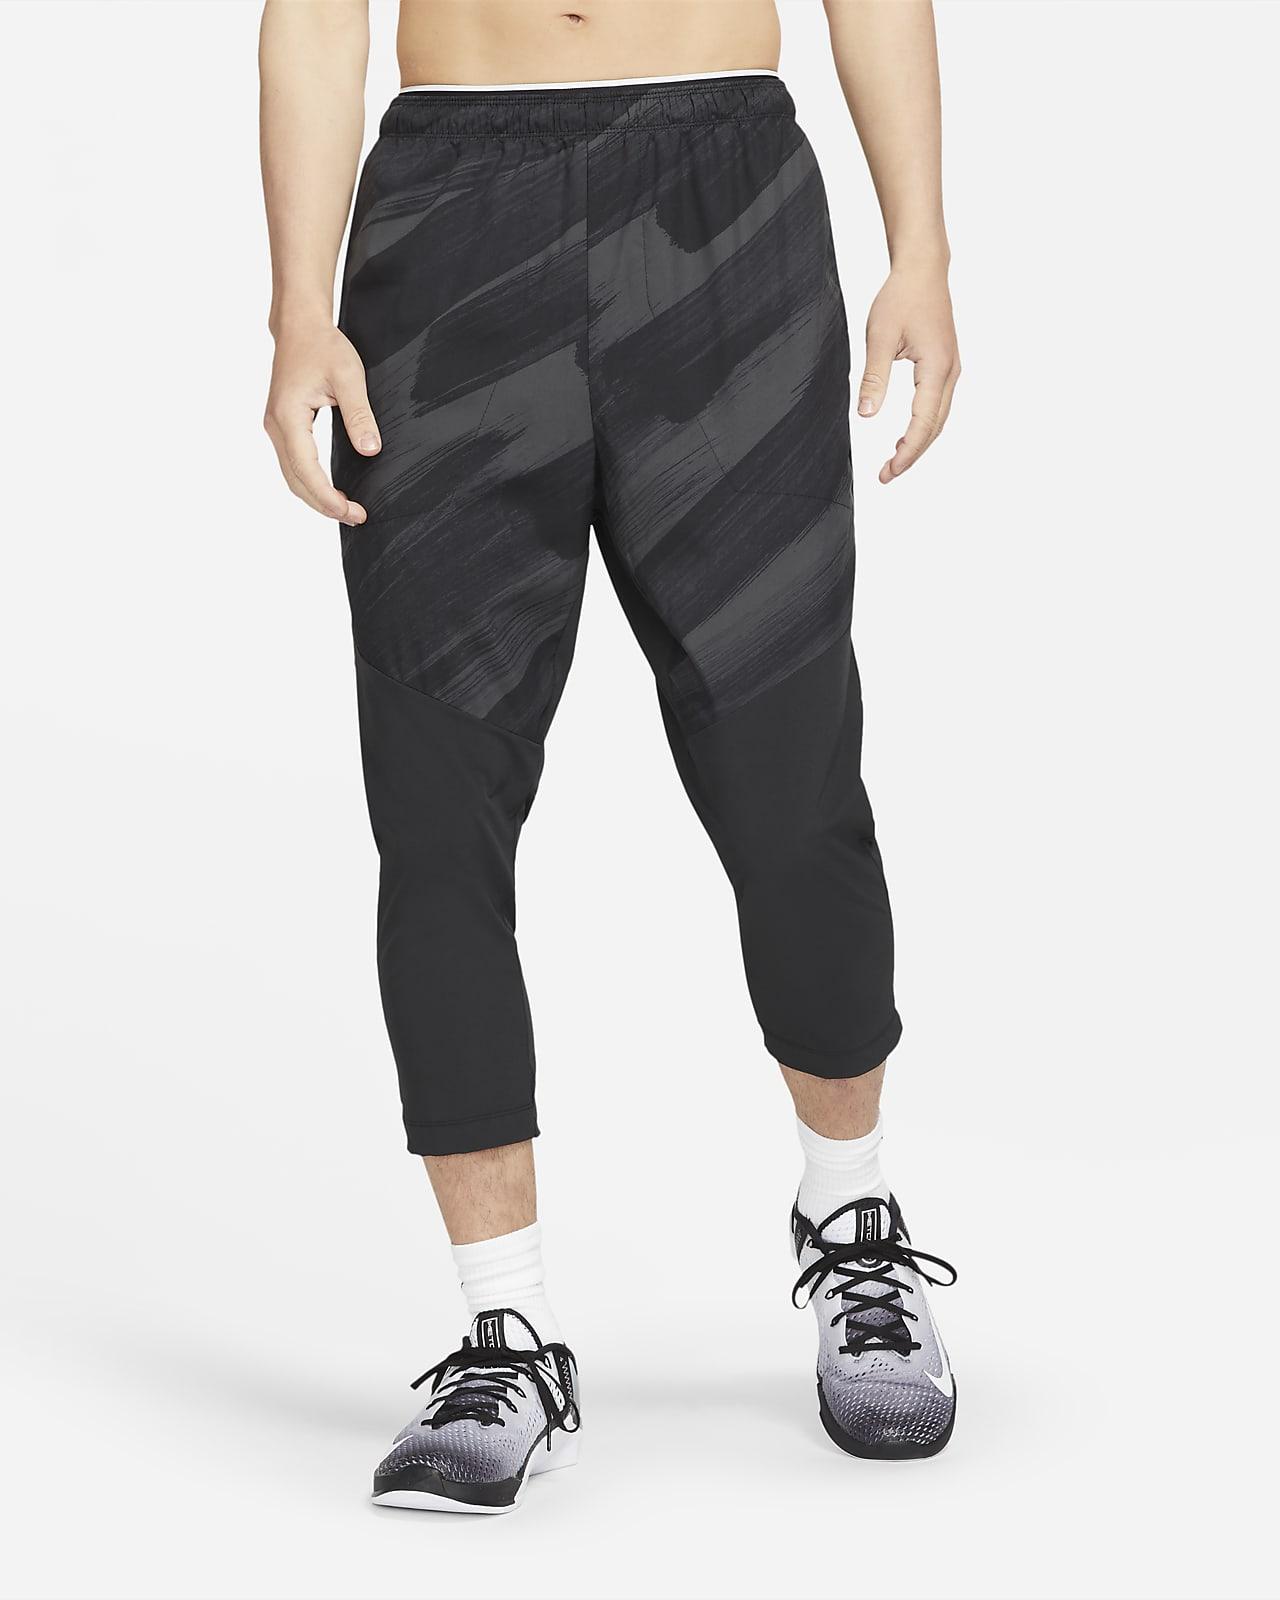 Nike Dri-FIT Sport Clash Men's Woven Training Trousers